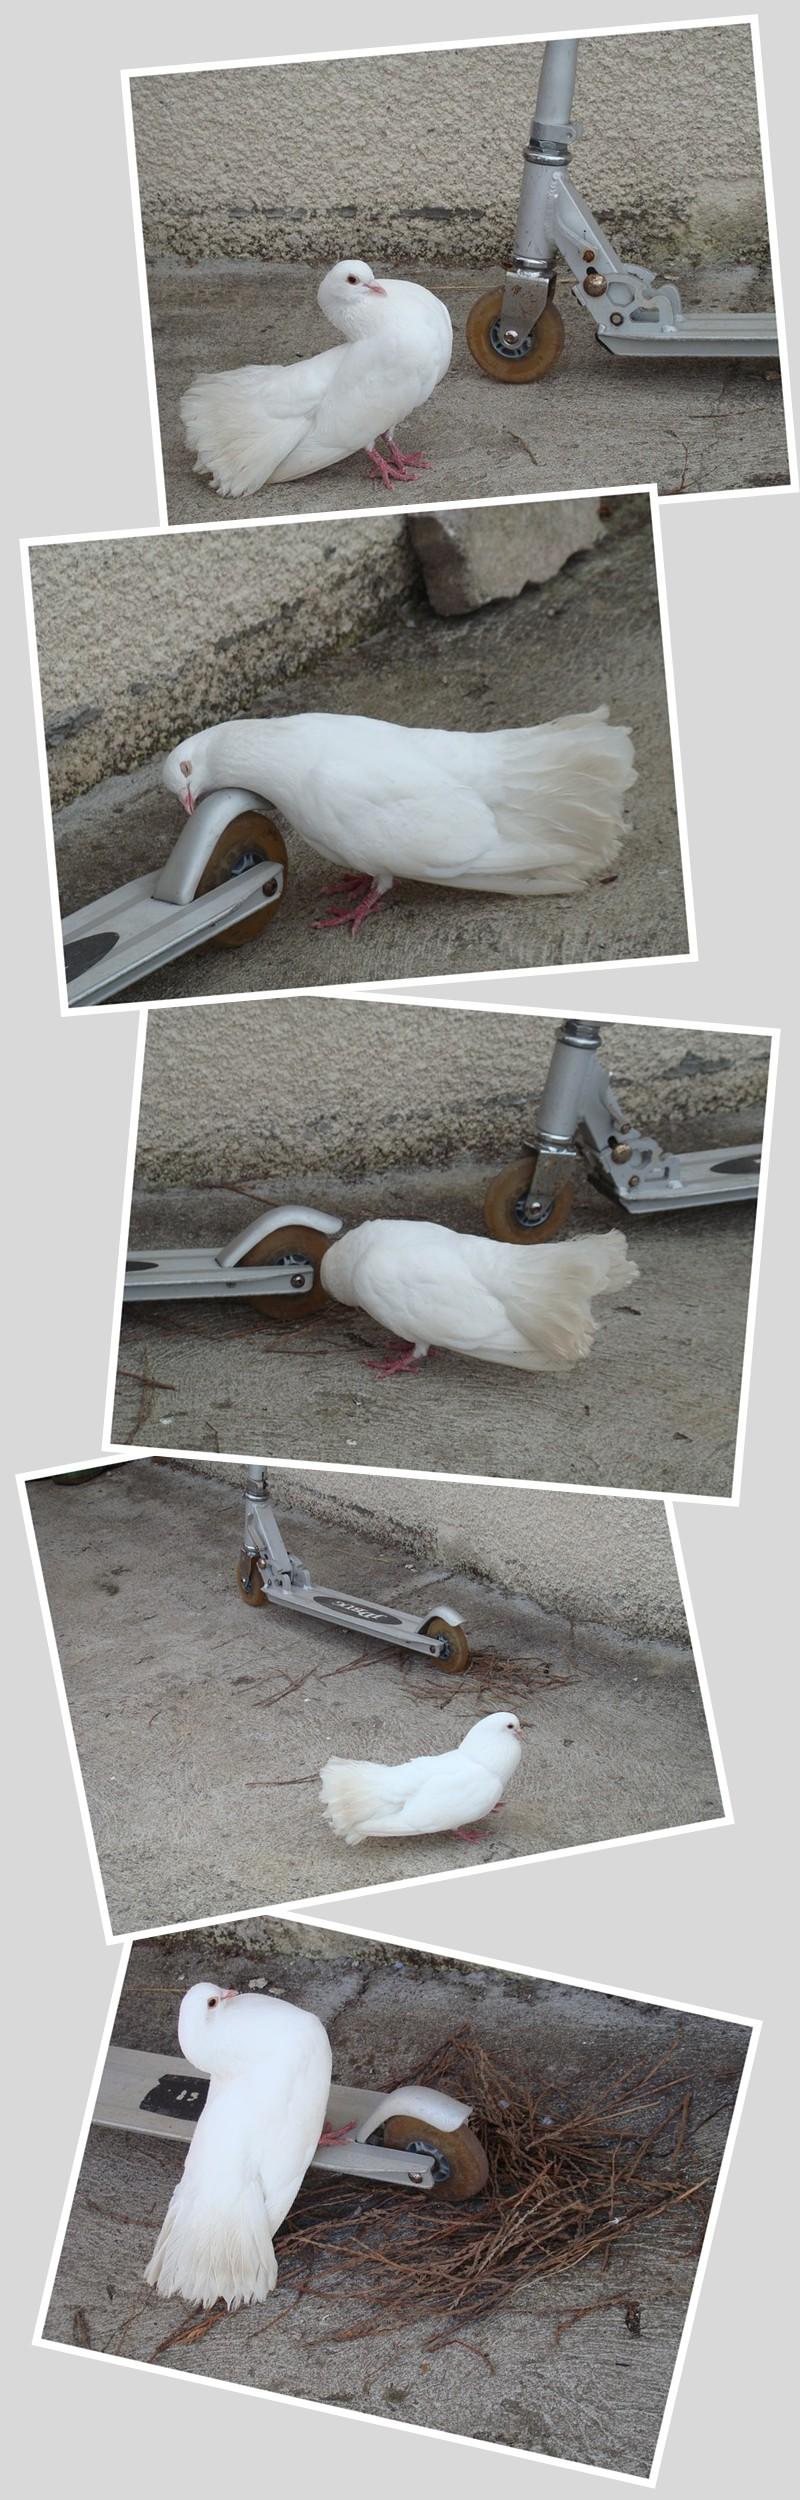 pigeontinette.jpg